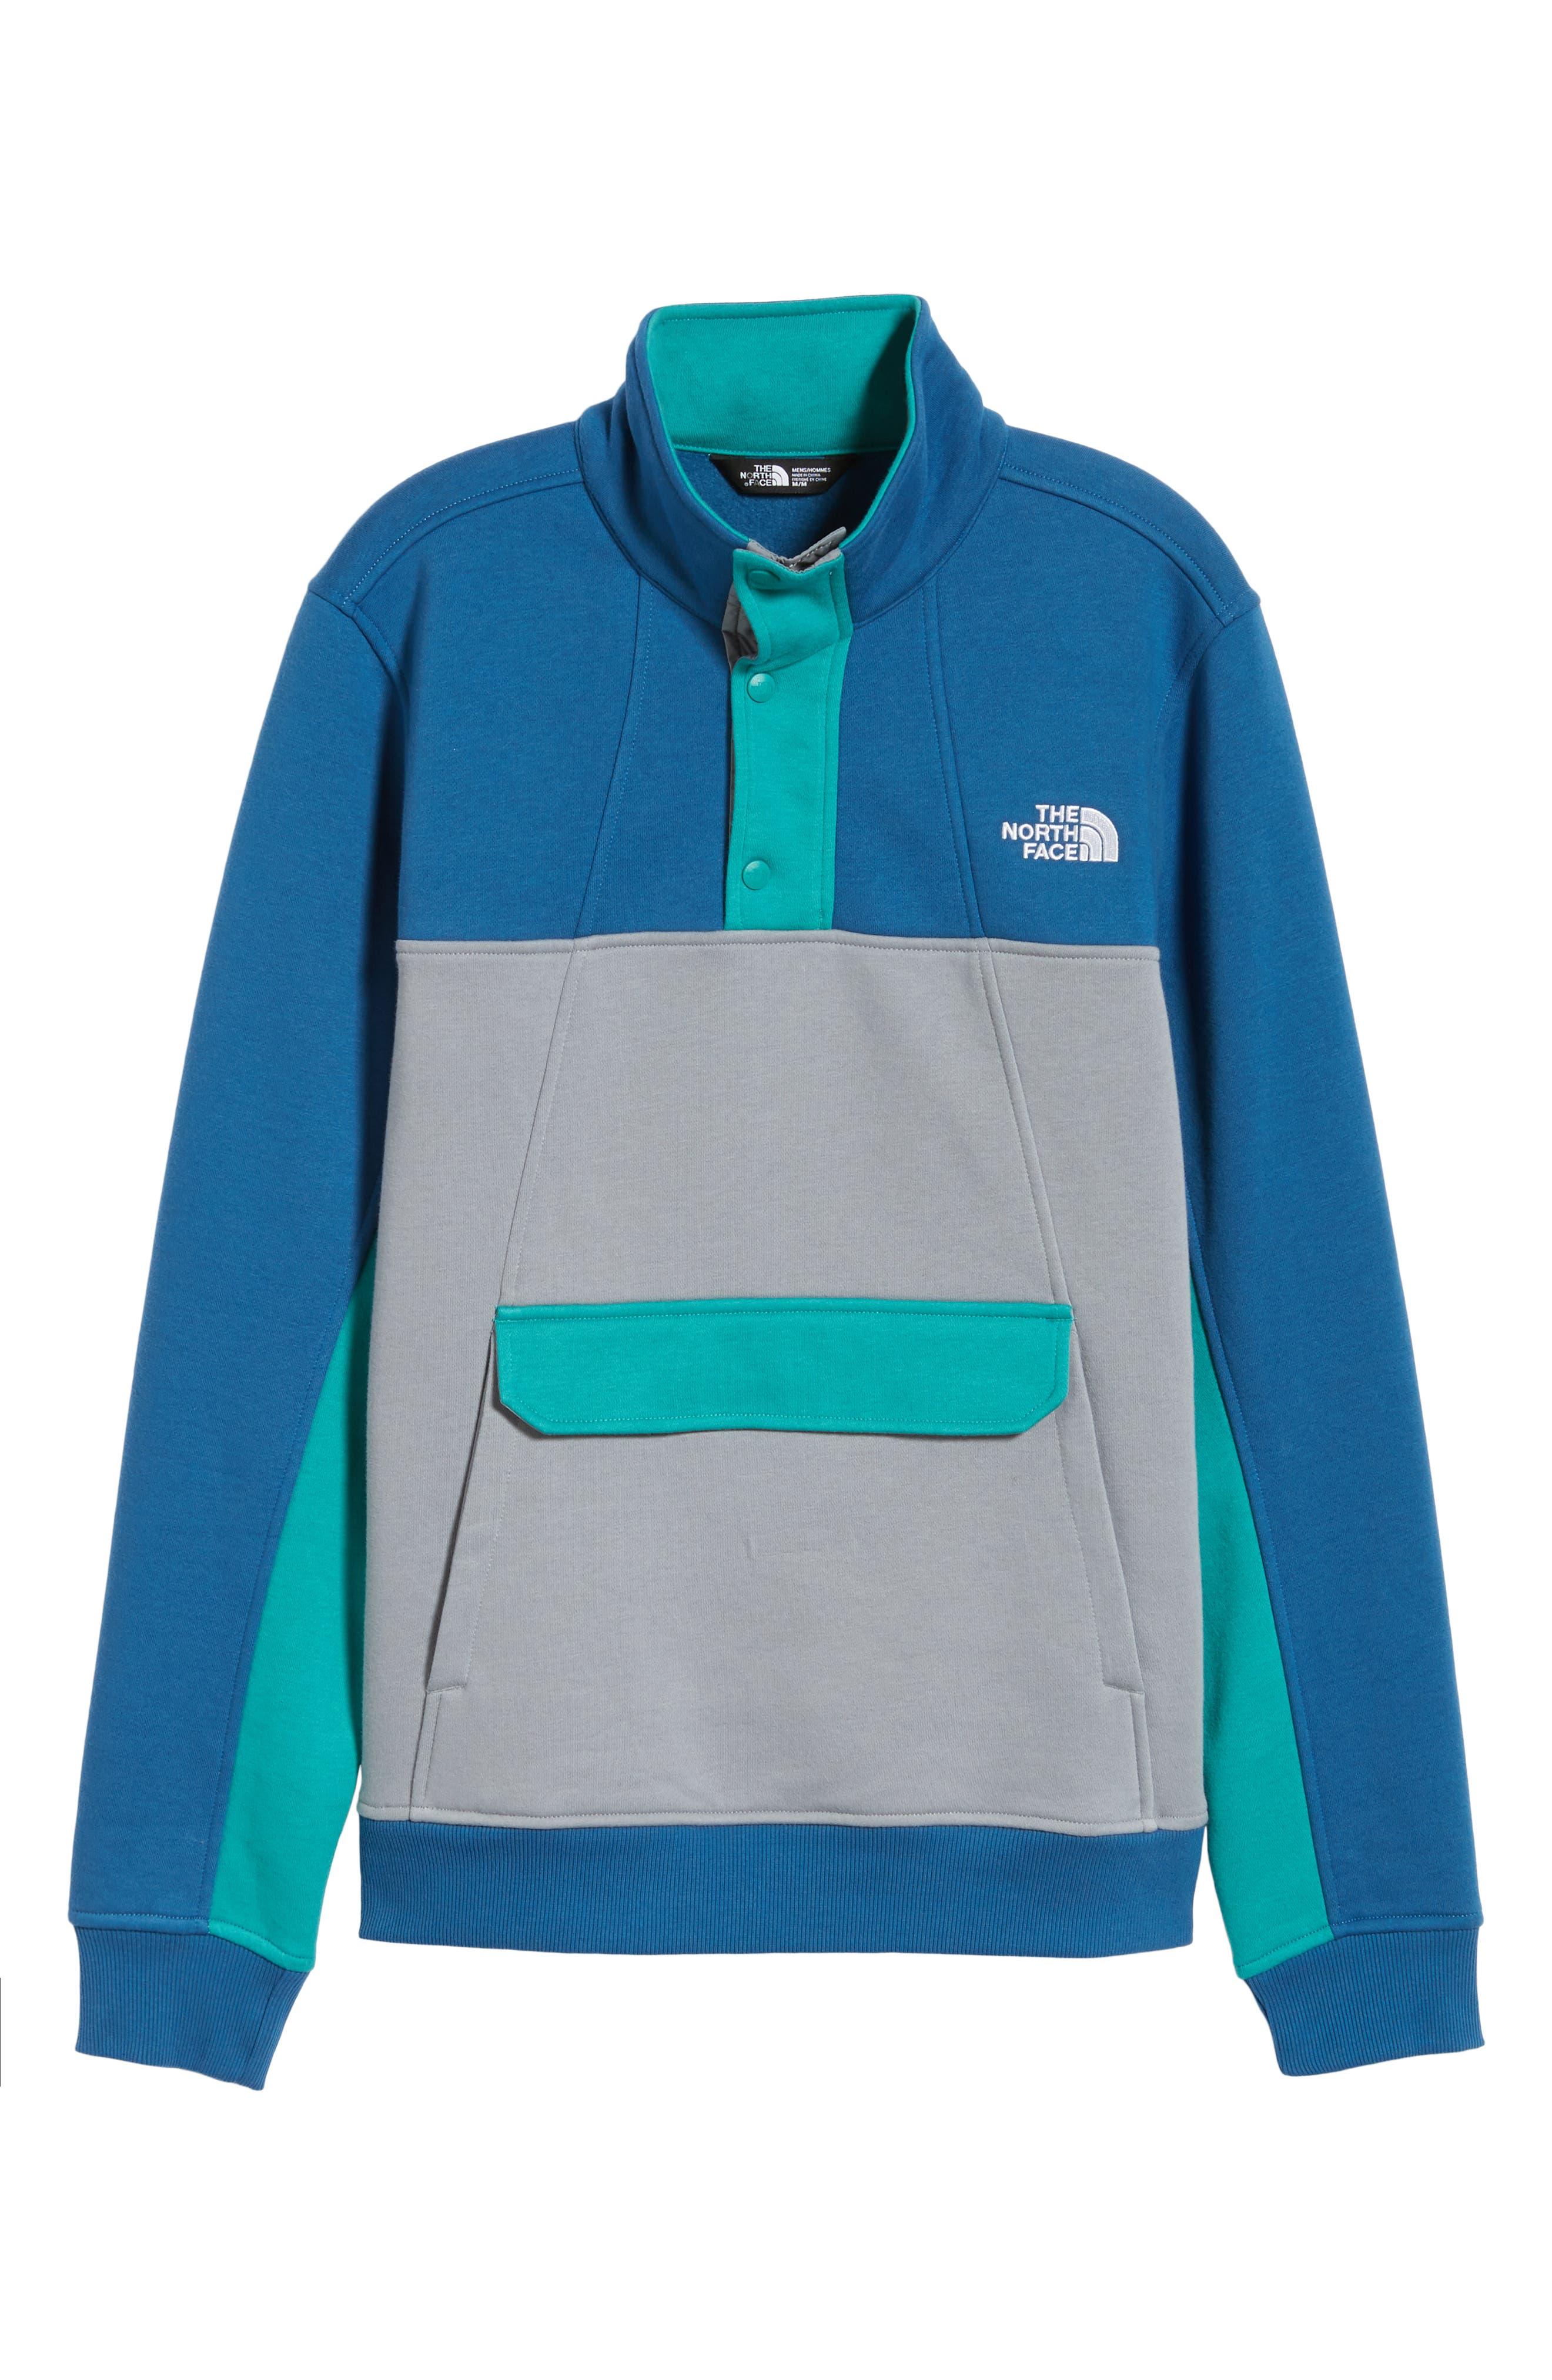 Alphabet City Fleece Pullover,                             Alternate thumbnail 6, color,                             DISH BLUE/ MID GREY/ GREEN